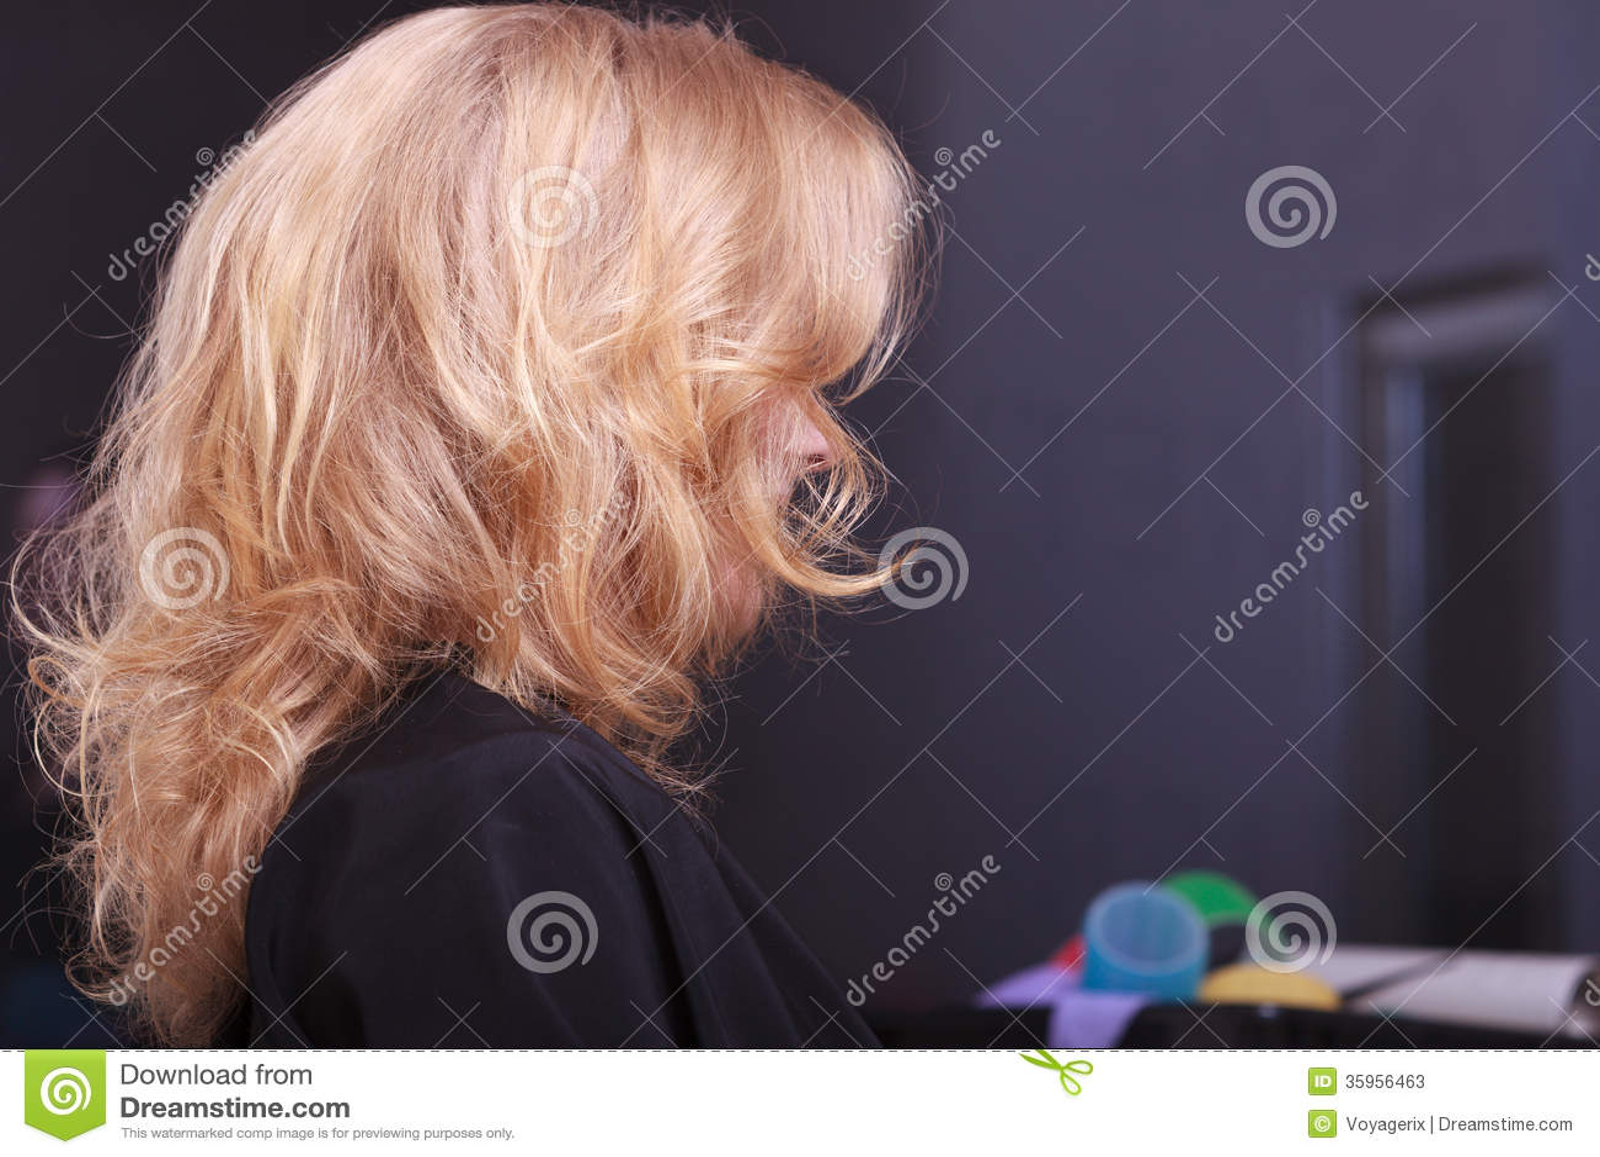 Pelo ondulado rubio femenino. Detrás de la cabeza de la mujer. Peluquero. Salón de belleza.